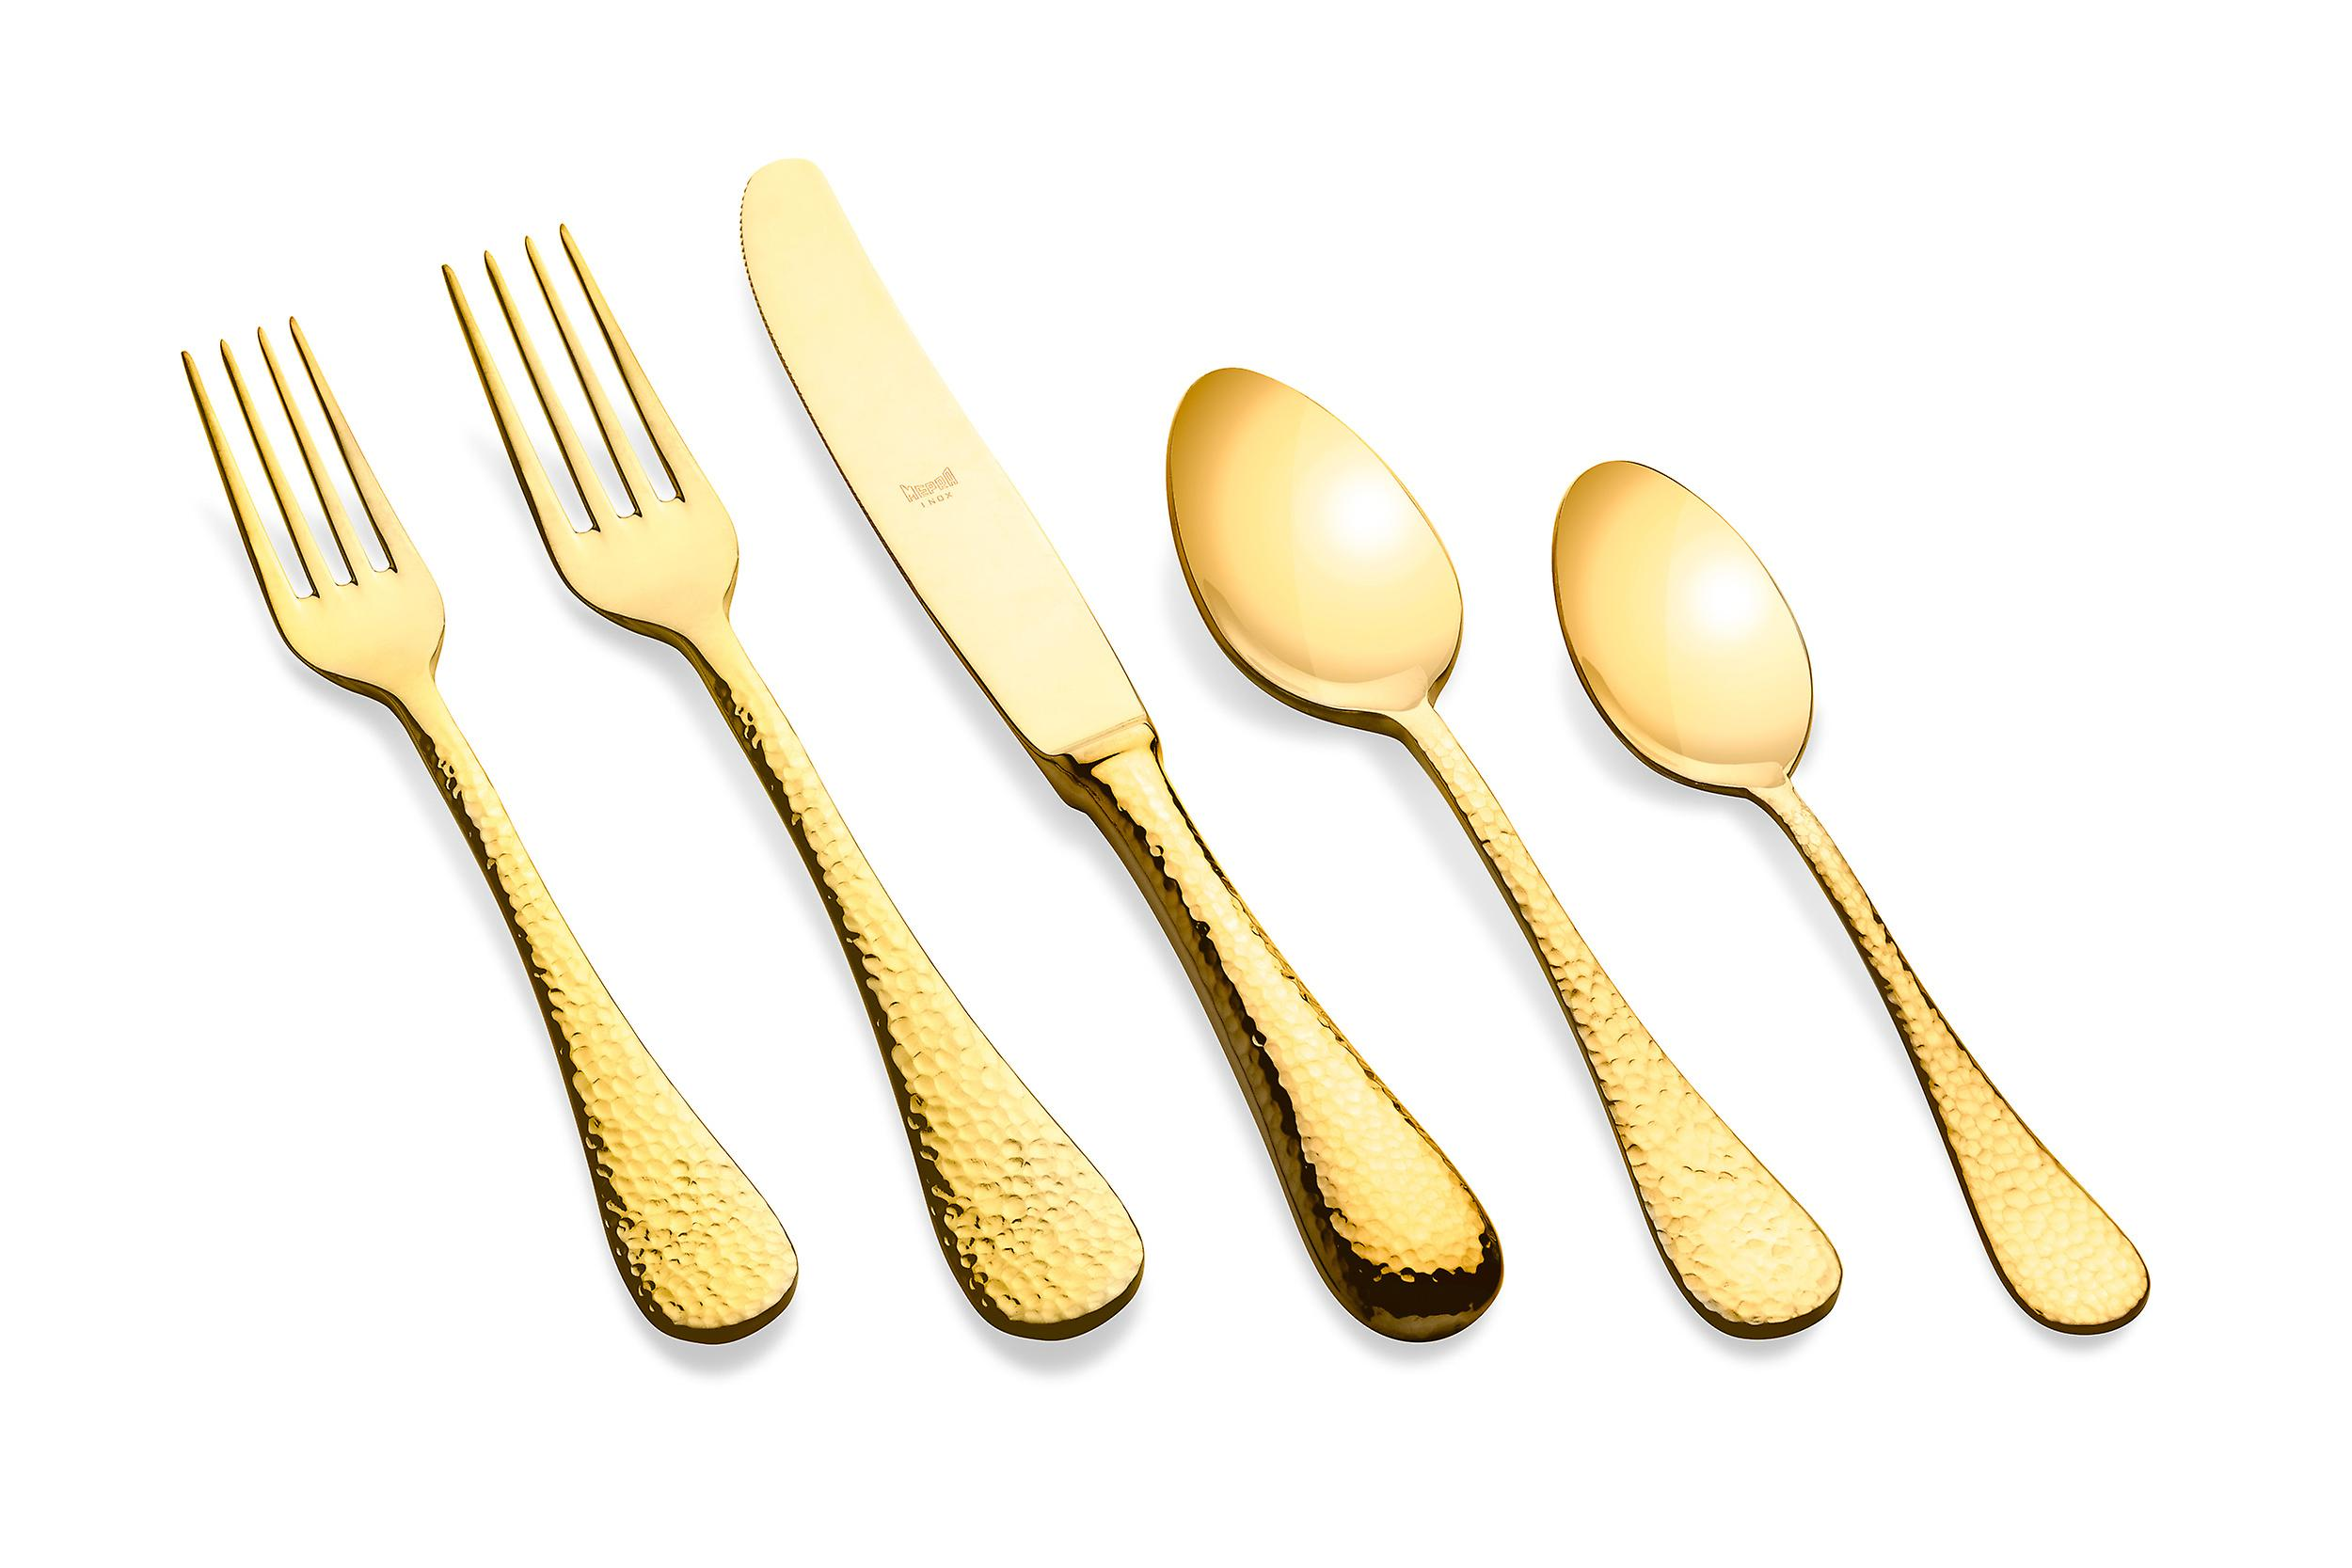 Mepra Epoque Oro 5 pcs flatware set